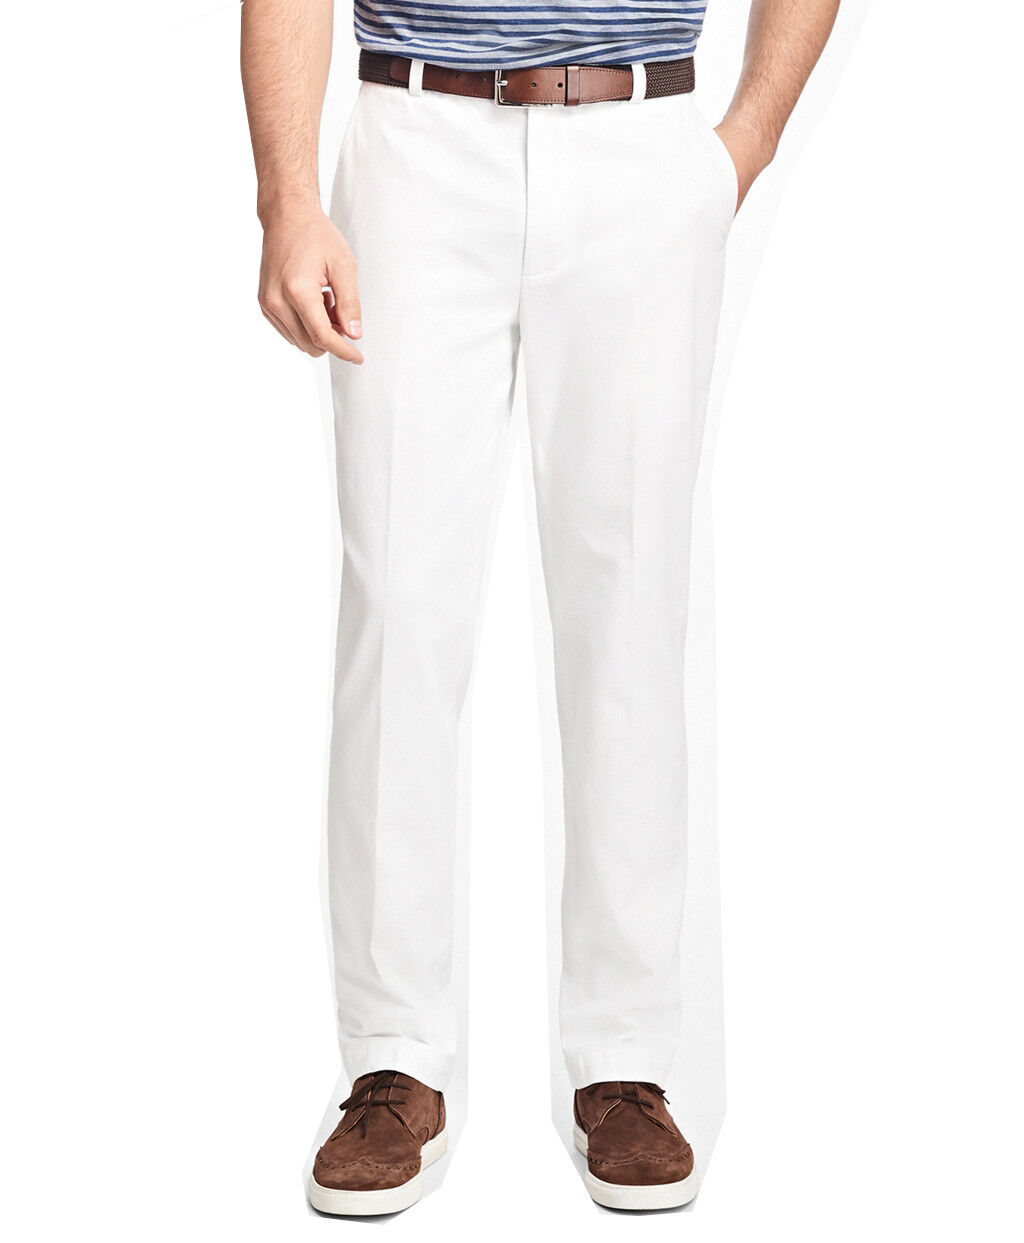 Brooks Bredhers Mens Clark Garment-Dyed Cotton Pant, White (35 32) 5344-2